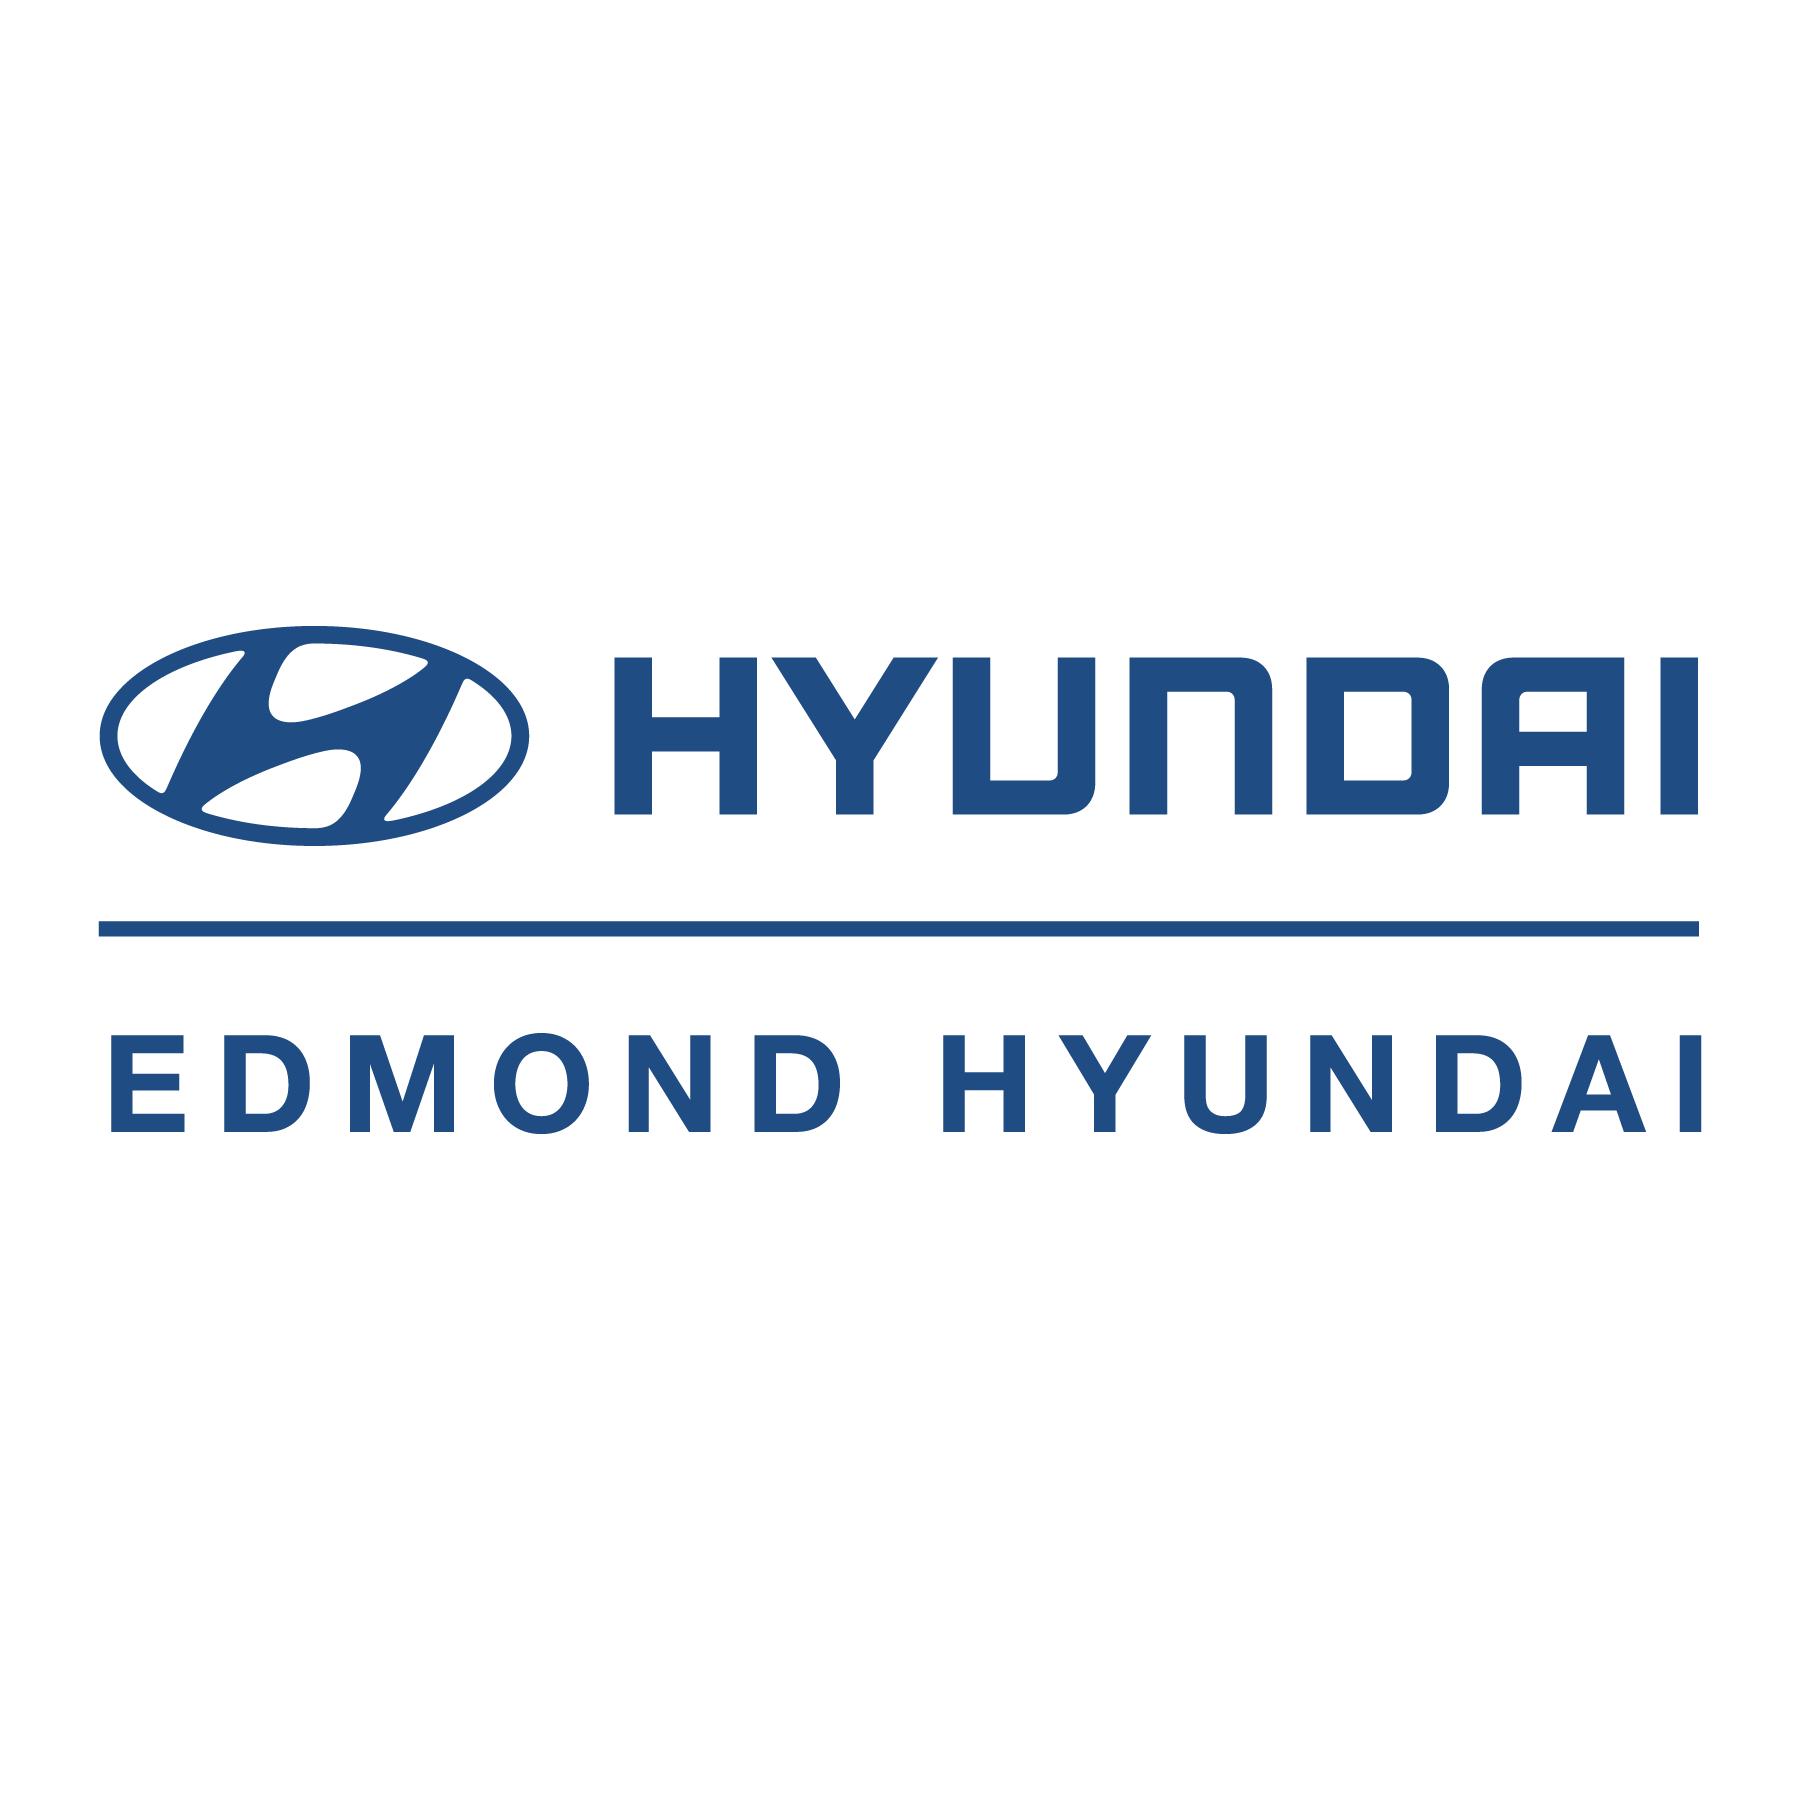 Retail - Automobiles, new and used – EDMOND, Oklahoma Company Data - Page 1